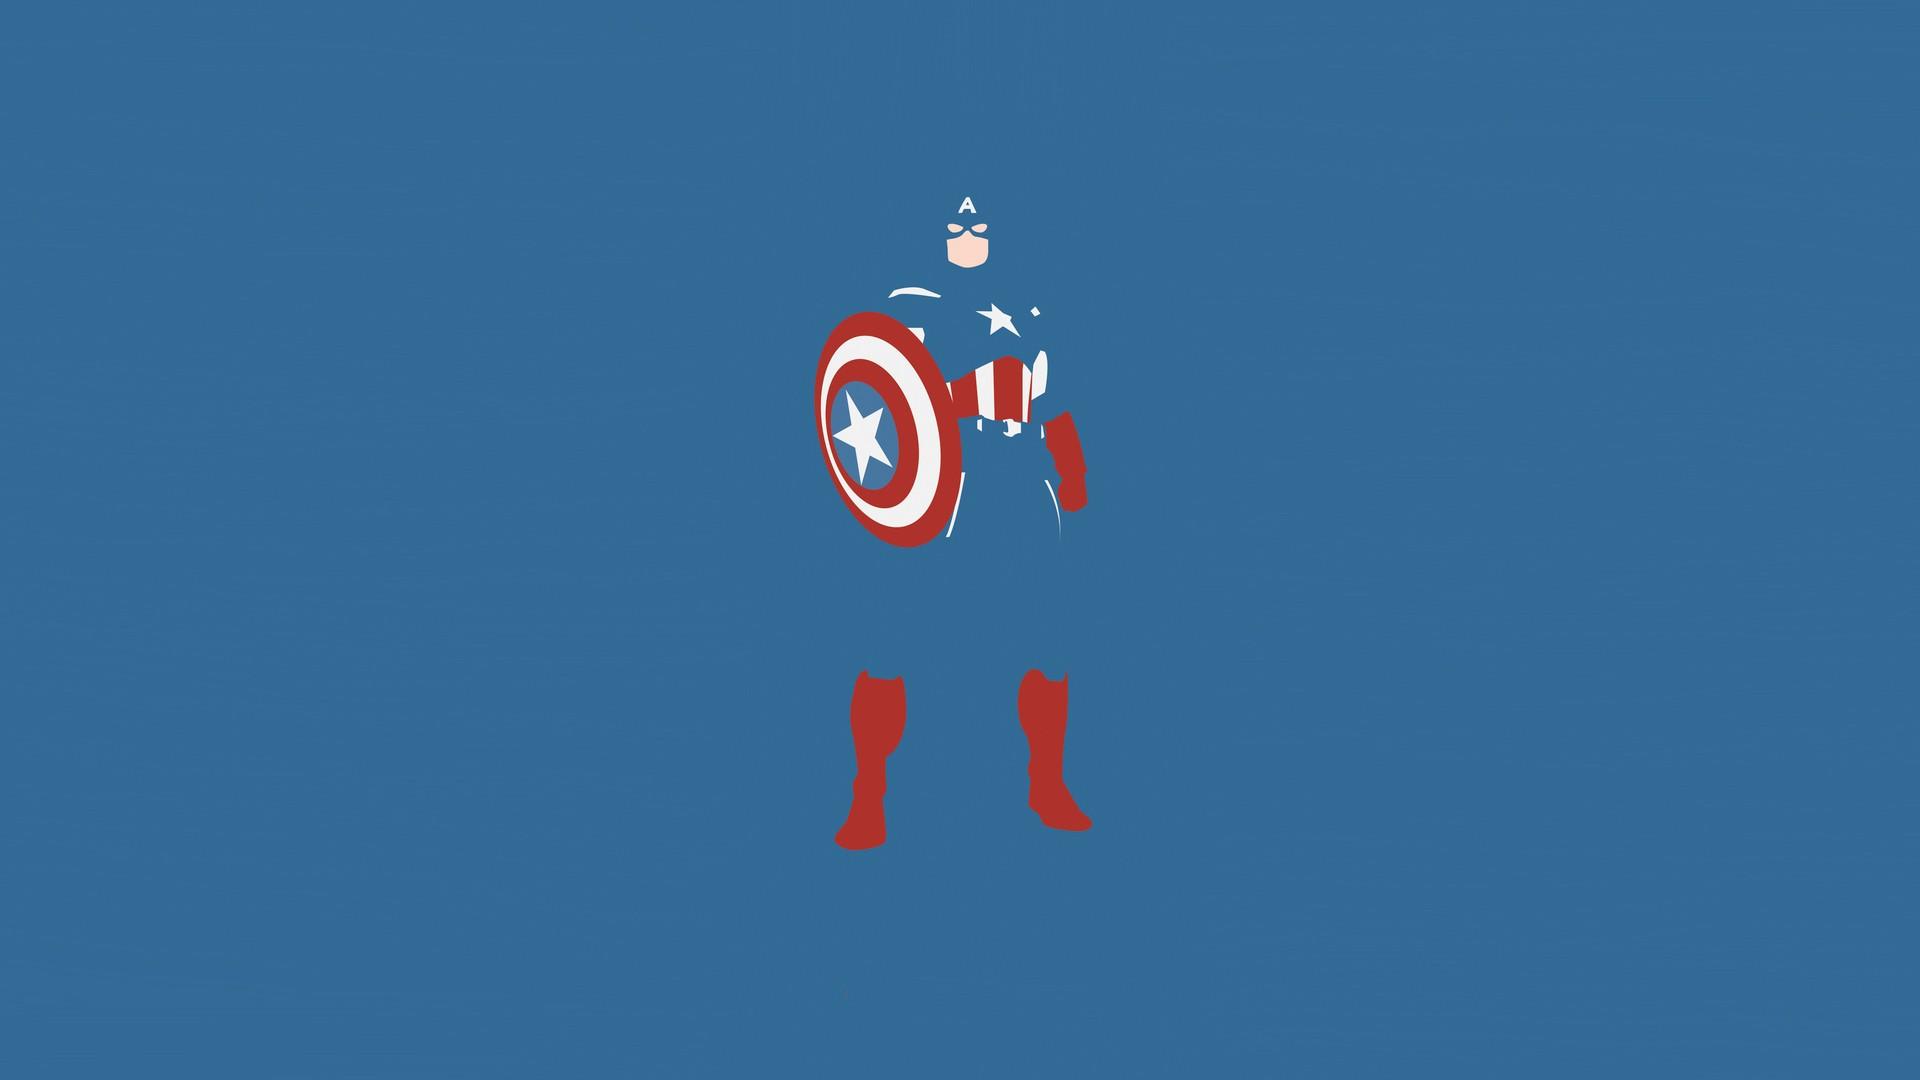 comics Captain America blue background wallpaper background 1920x1080